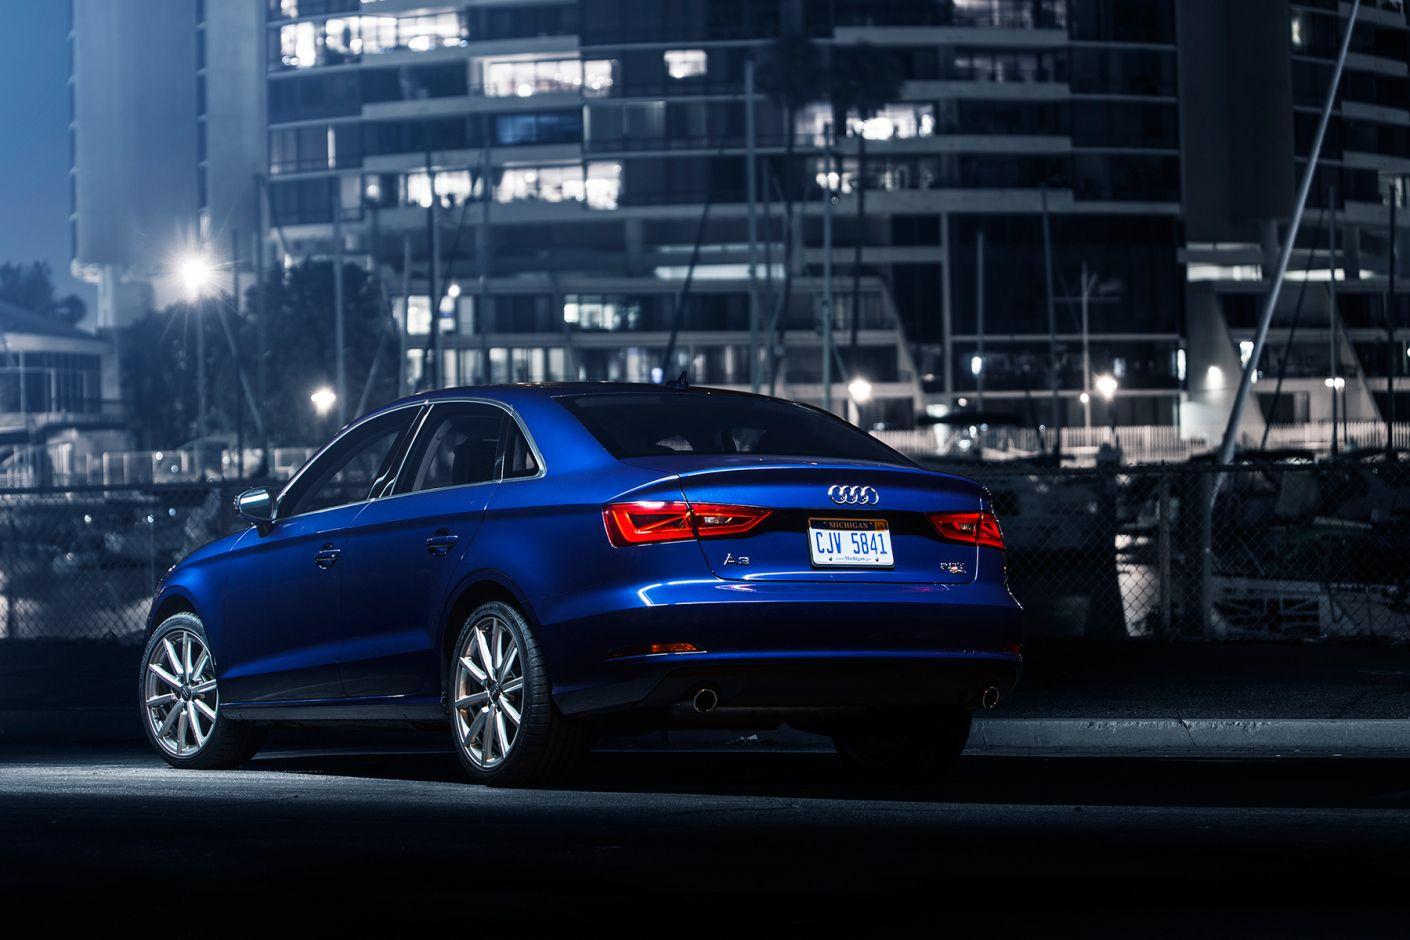 Audi A3 Sedan 2.0T Quattro S Tronic